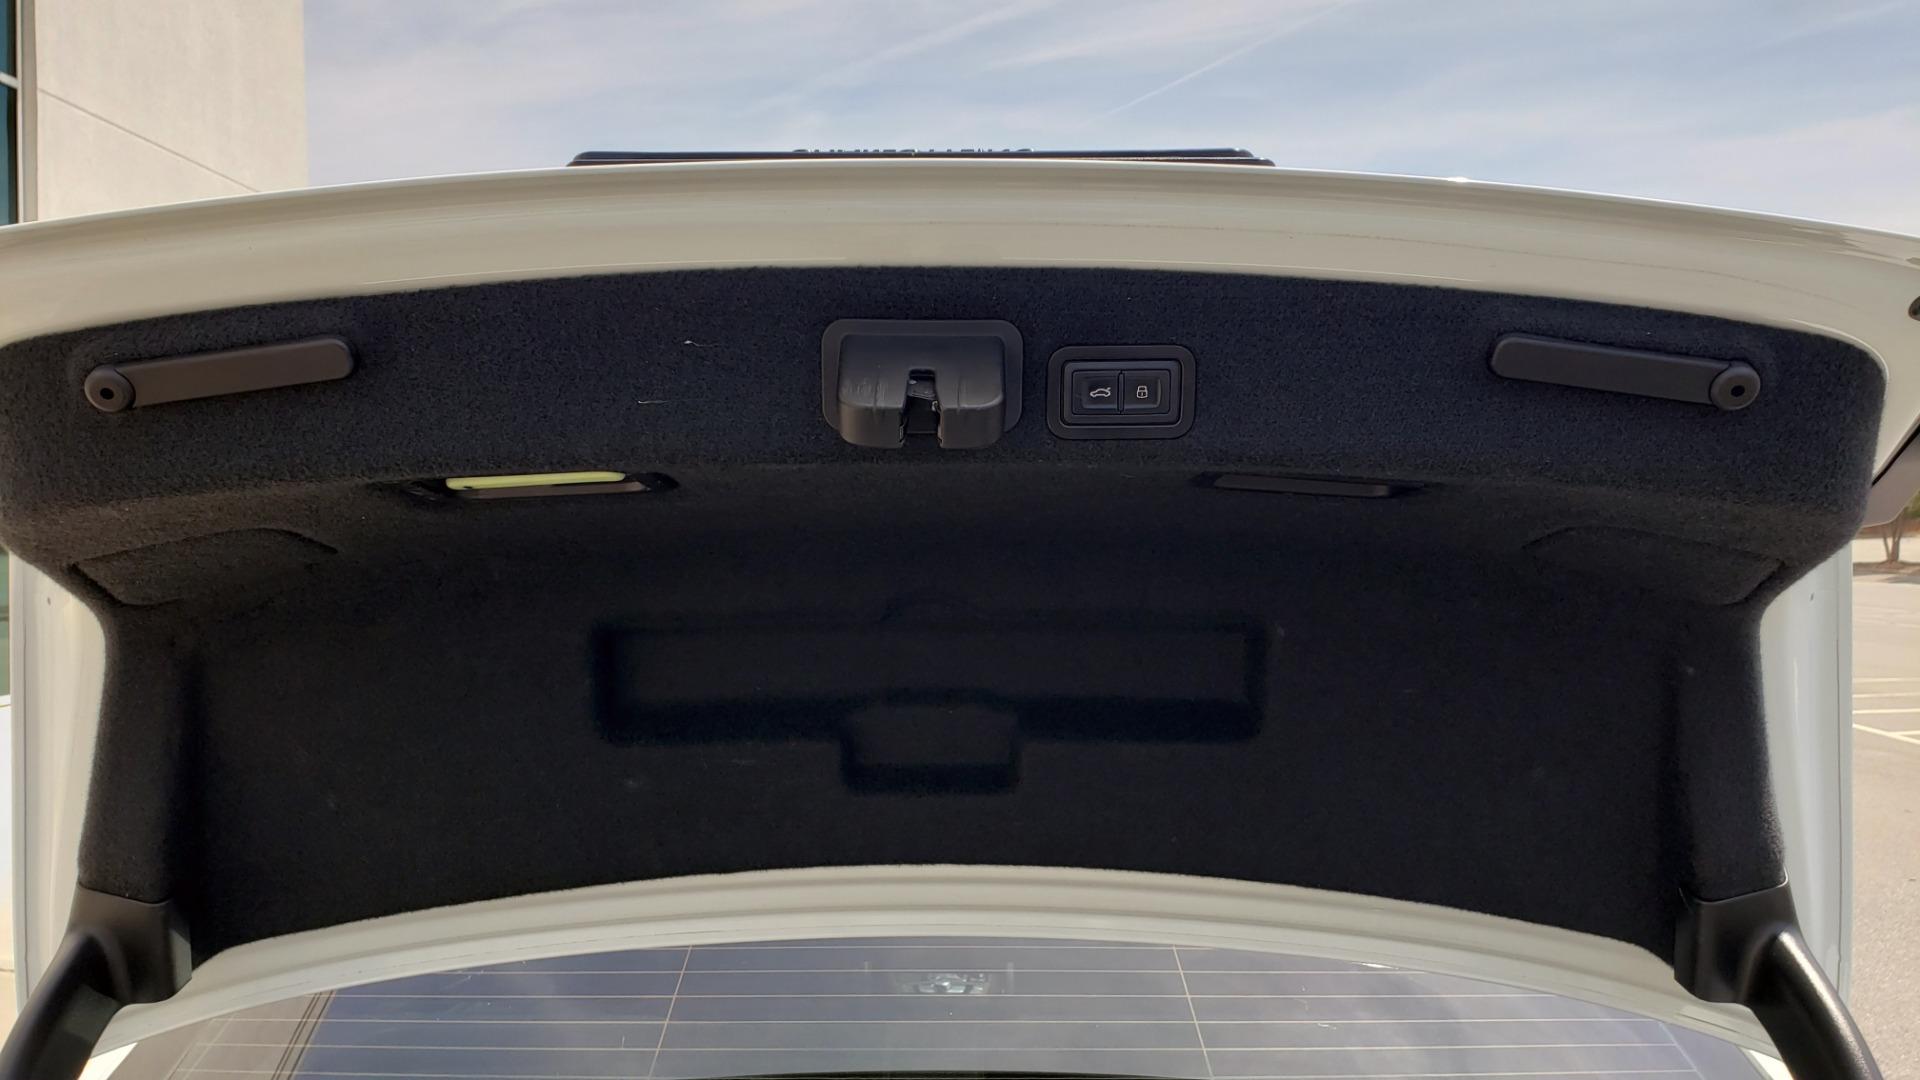 Used 2017 Audi A6 PRESTIGE SEDAN 3.0T / NAV / SUNROOF / BLACK OPTIC / CLD WTHR / REARVIEW for sale $30,797 at Formula Imports in Charlotte NC 28227 21